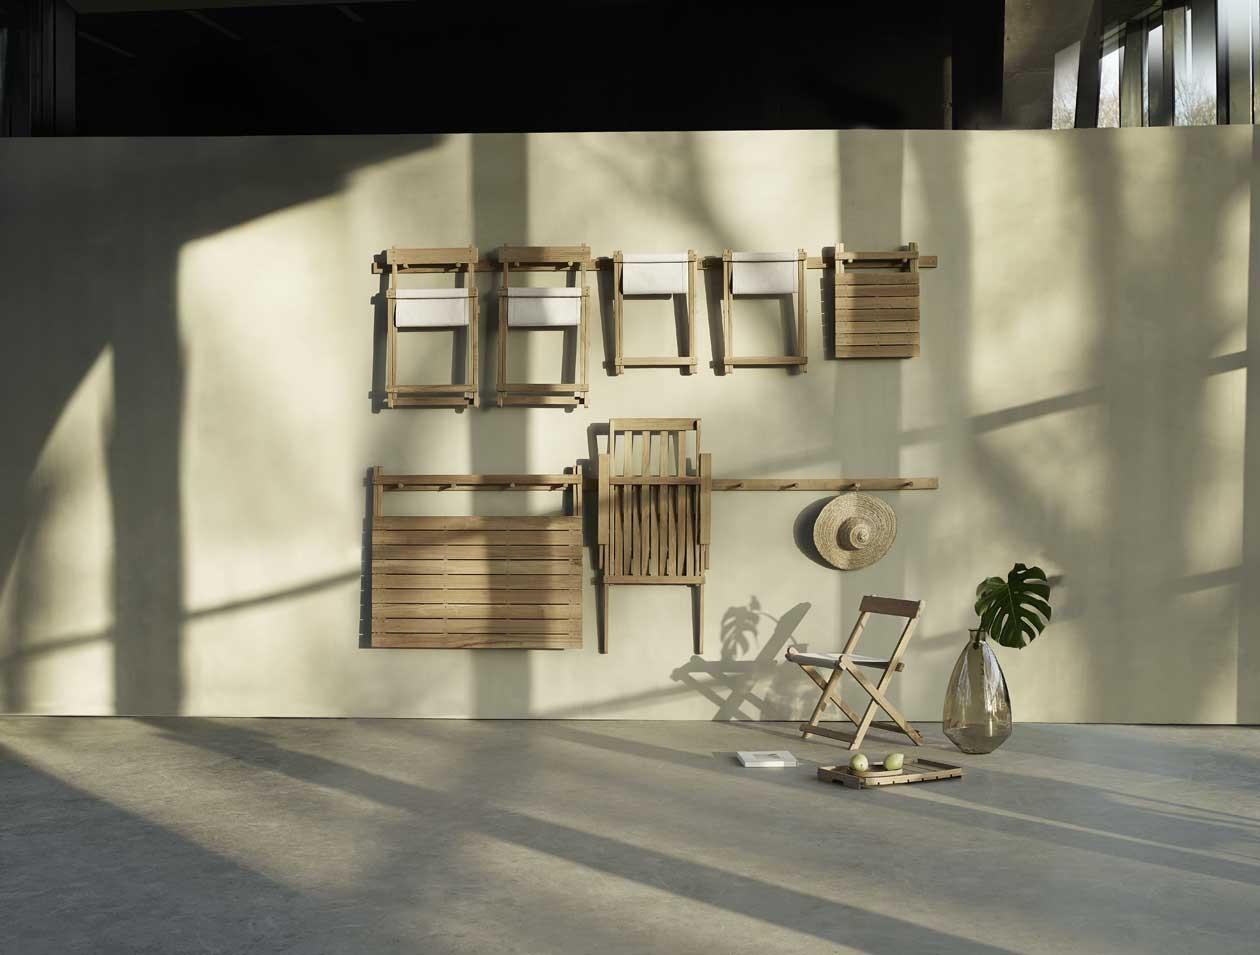 Mogensen-deck-chair-series-overviewZLwBtd4tU0w9m